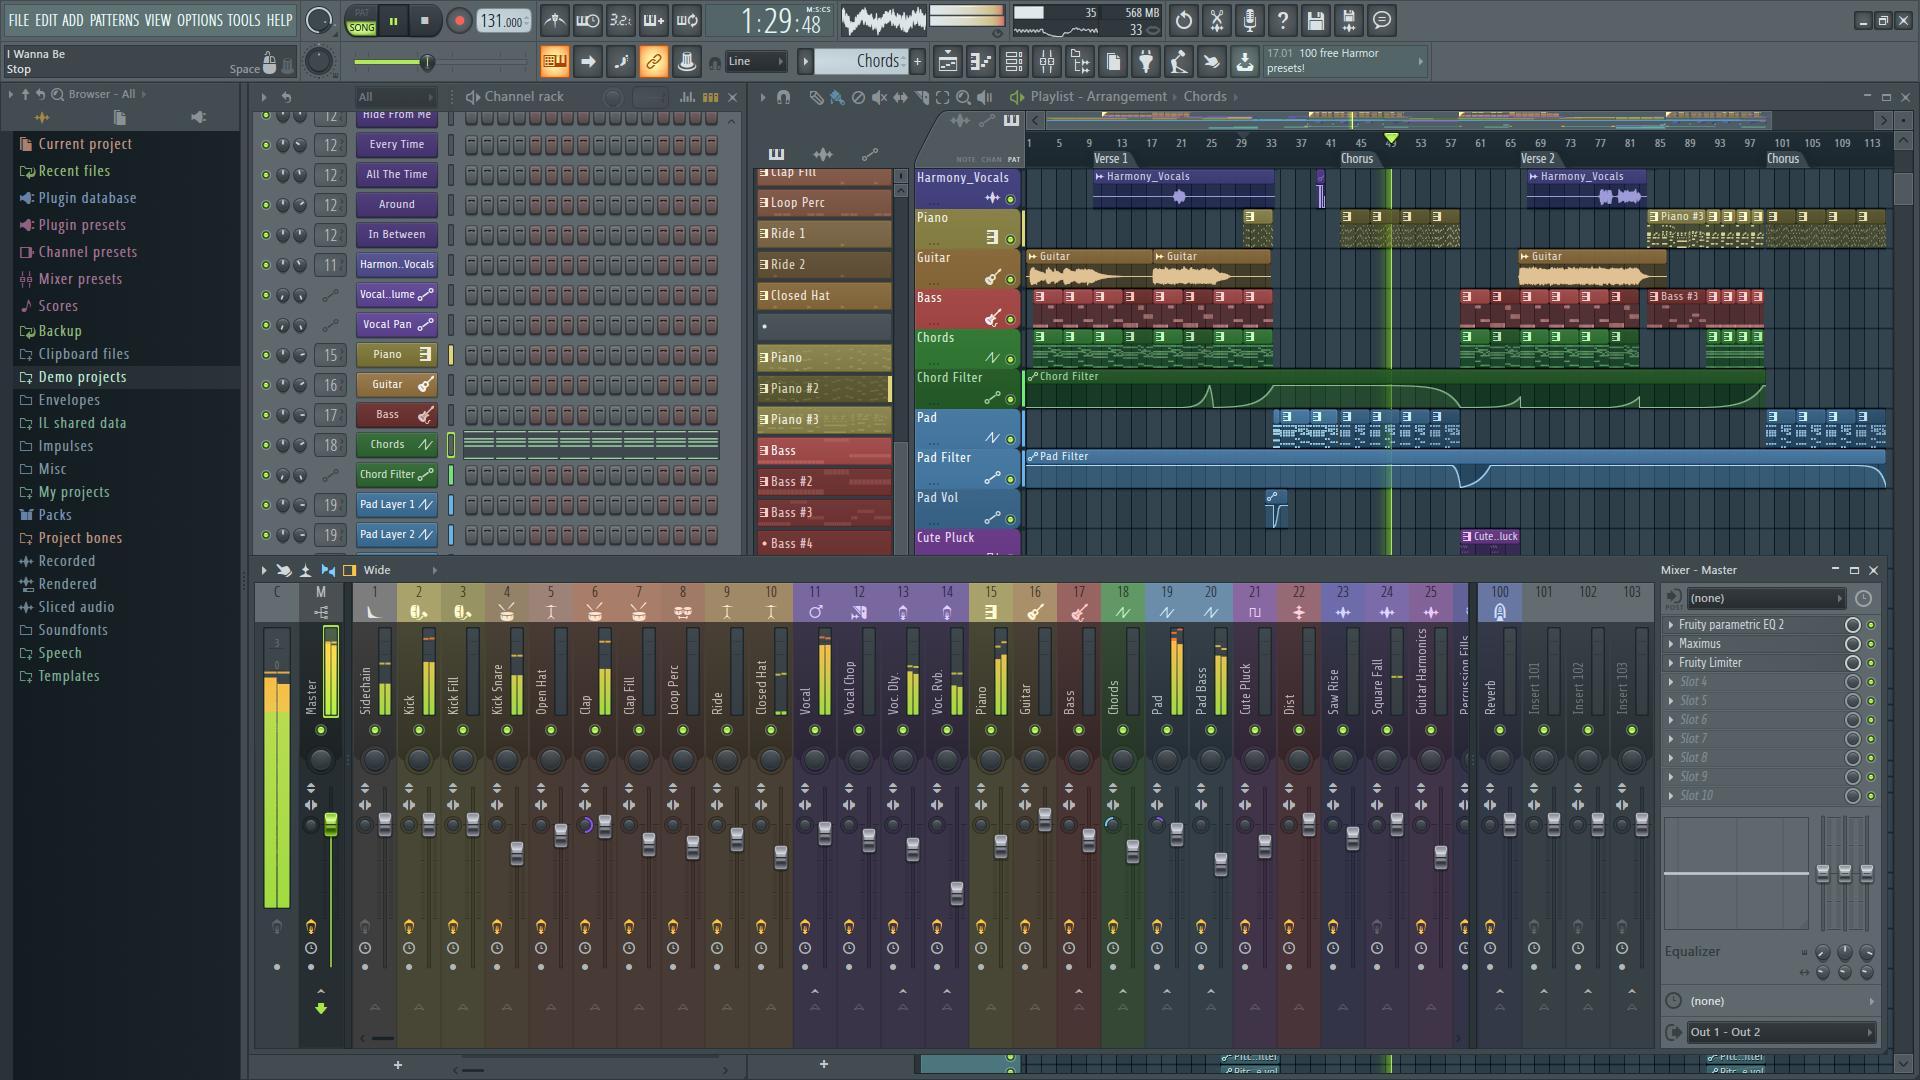 FL Studio 20 5 Signature Bundle 32 bit and 64 bit - UPDATED - ONE CLICK  INSTALLATION - Lifetime No Expiration Send thru email download